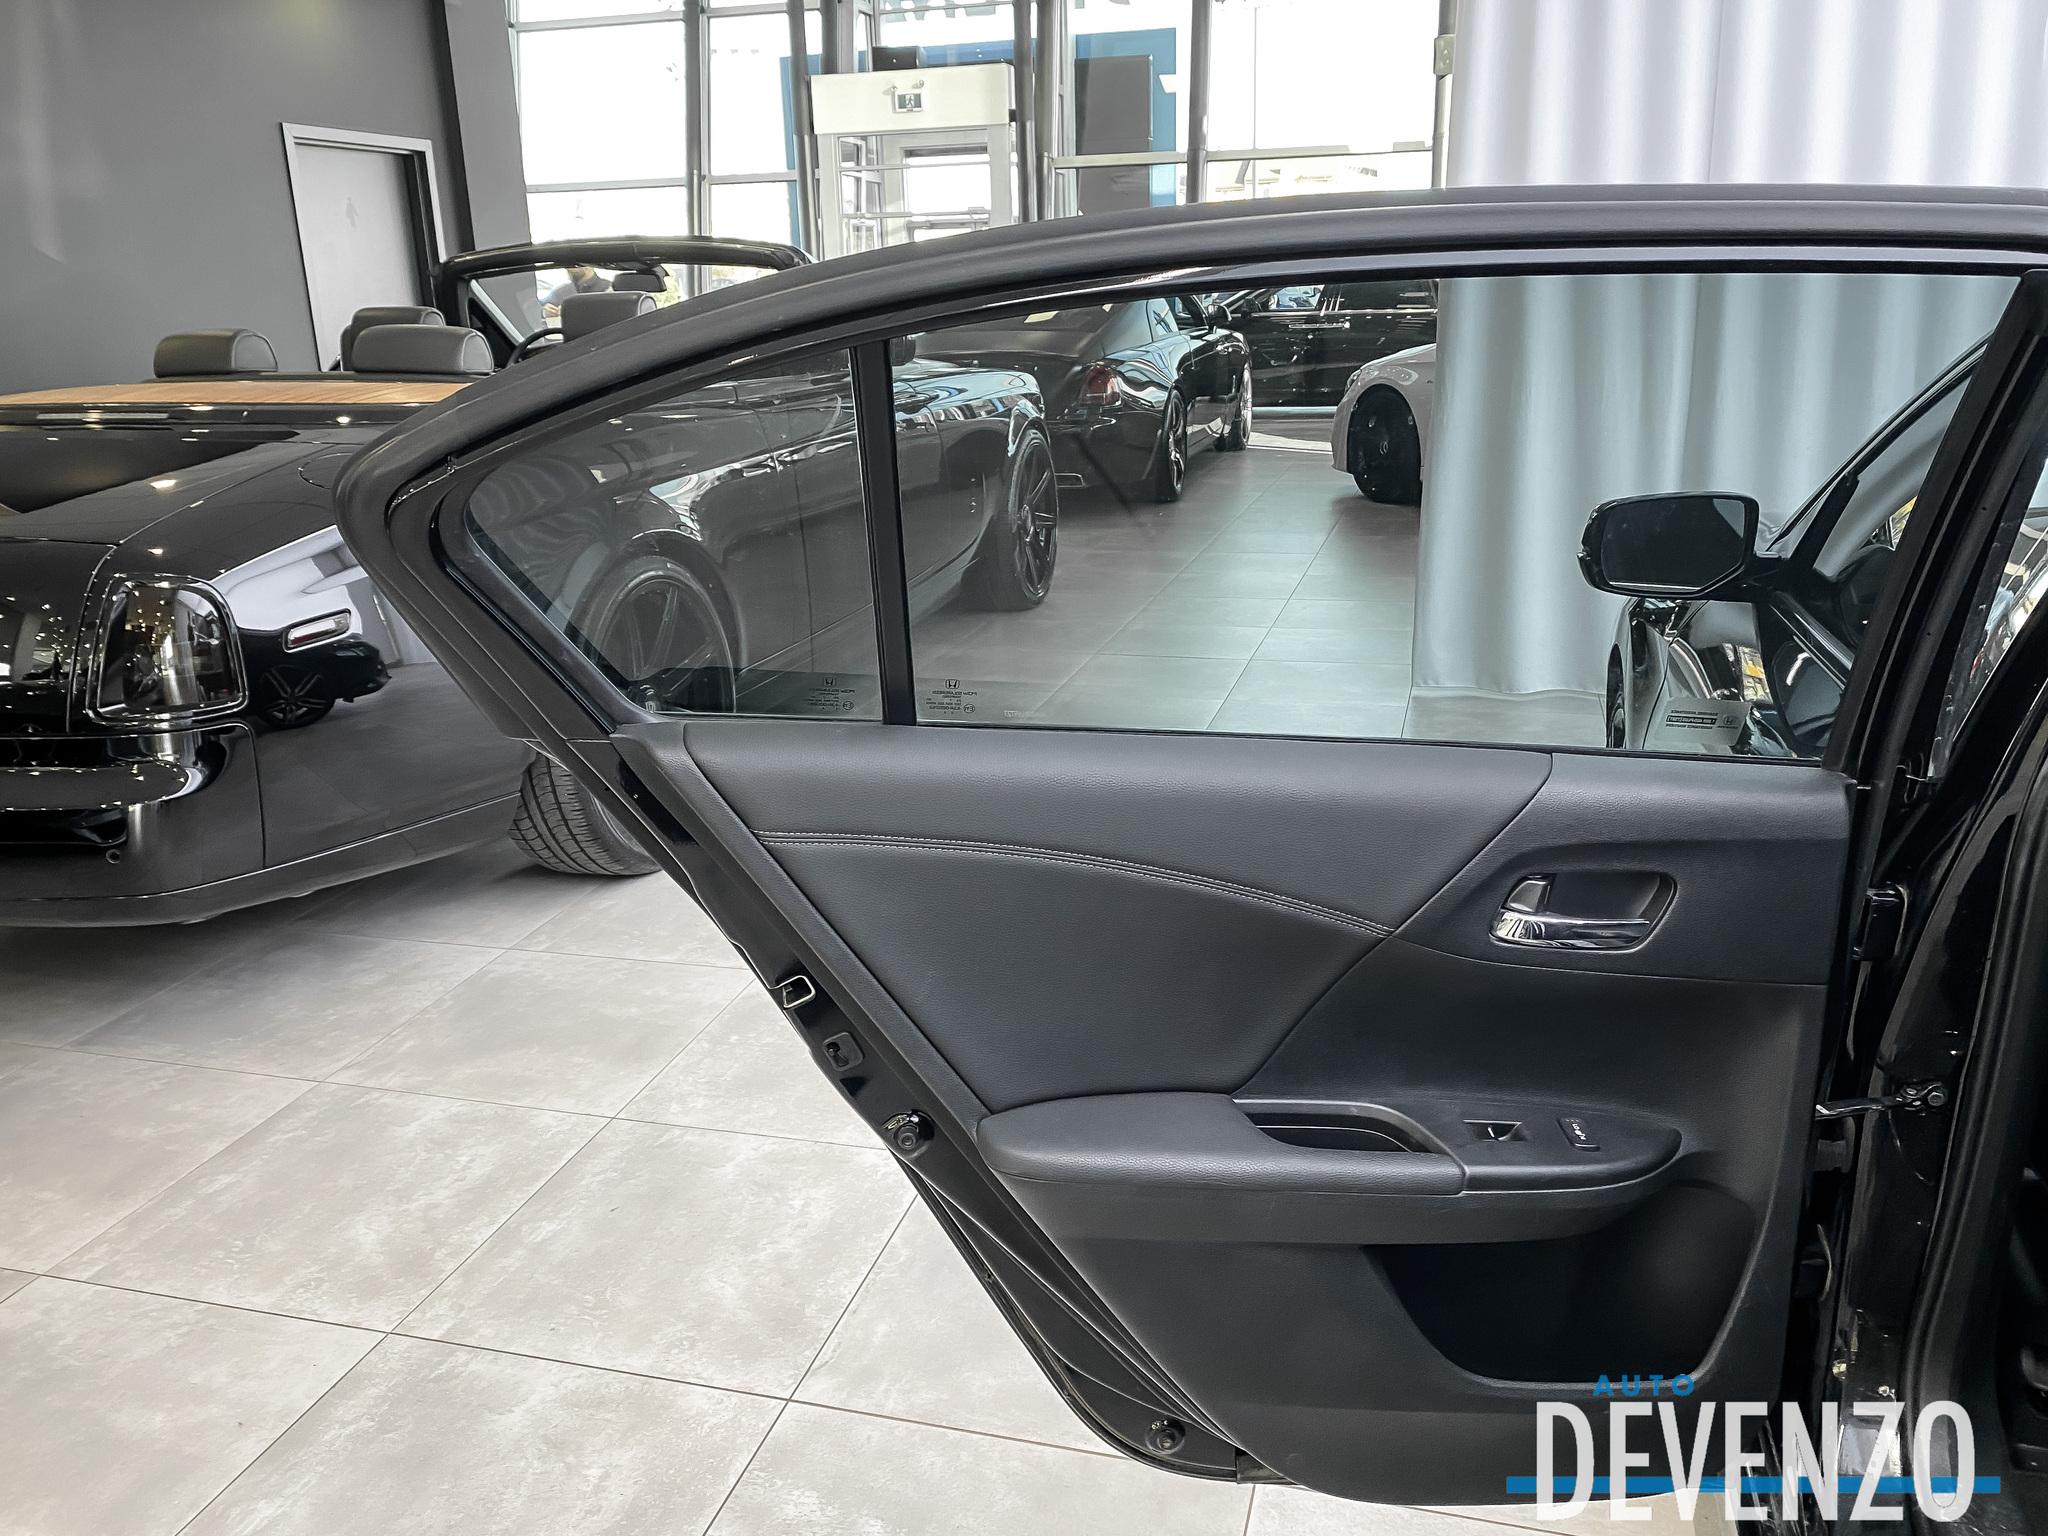 2017 Honda Accord Sedan V6 Touring Cuir Toit Ouvrant GPS Cruise Adaptif complet